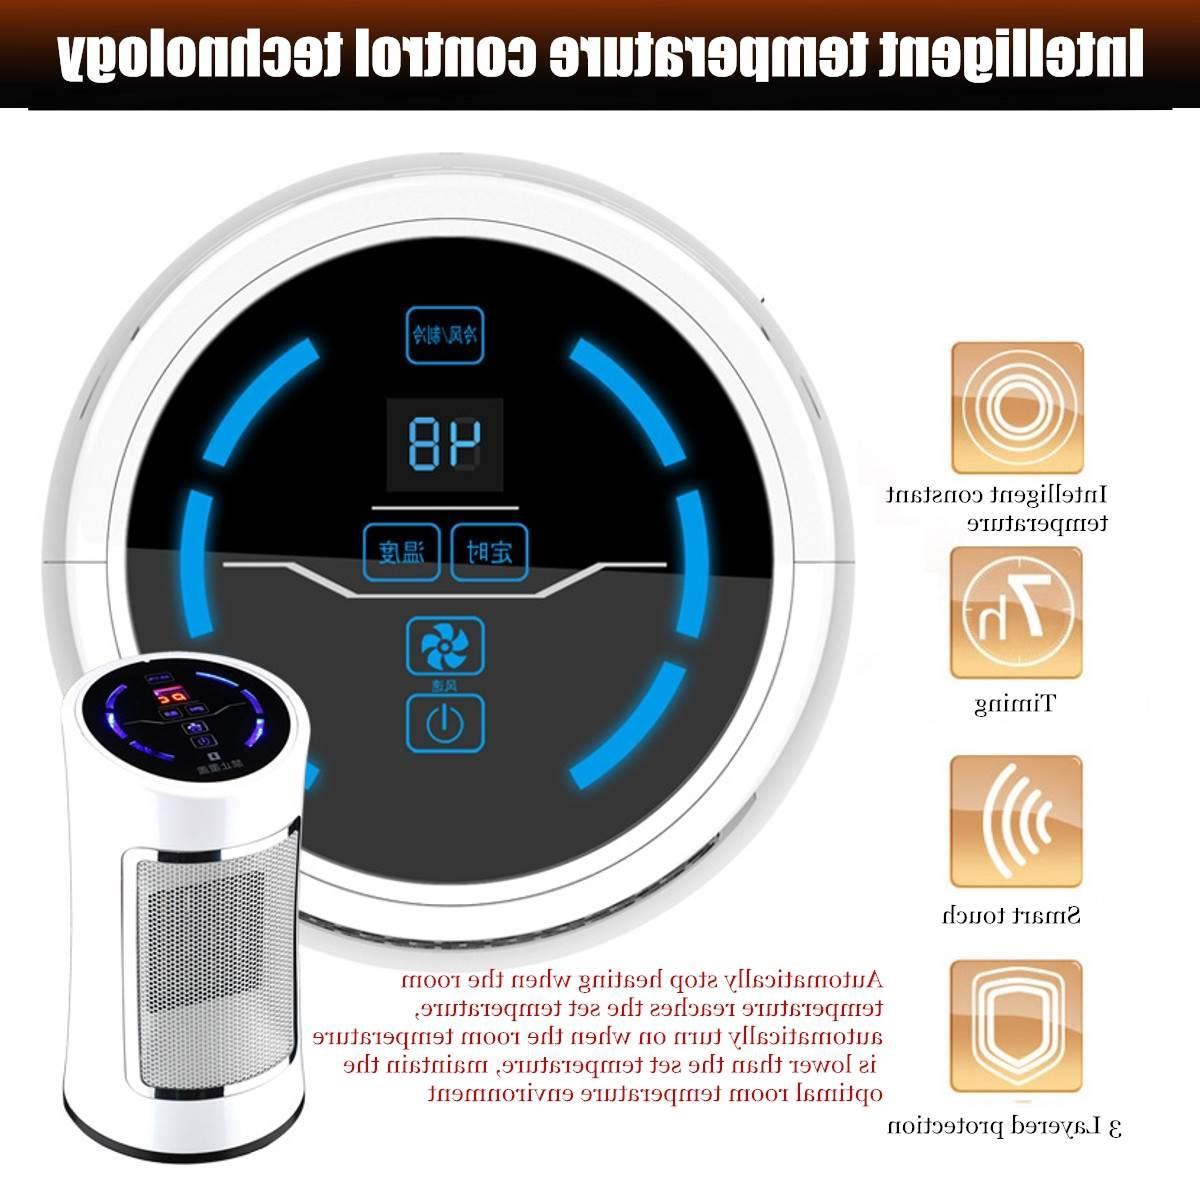 1500W <font><b>Air</b></font> <font><b>Conditioner</b></font> Electric Timing <font><b>Heater</b></font> <font><b>Heater</b></font> Bathroom Heating Portable